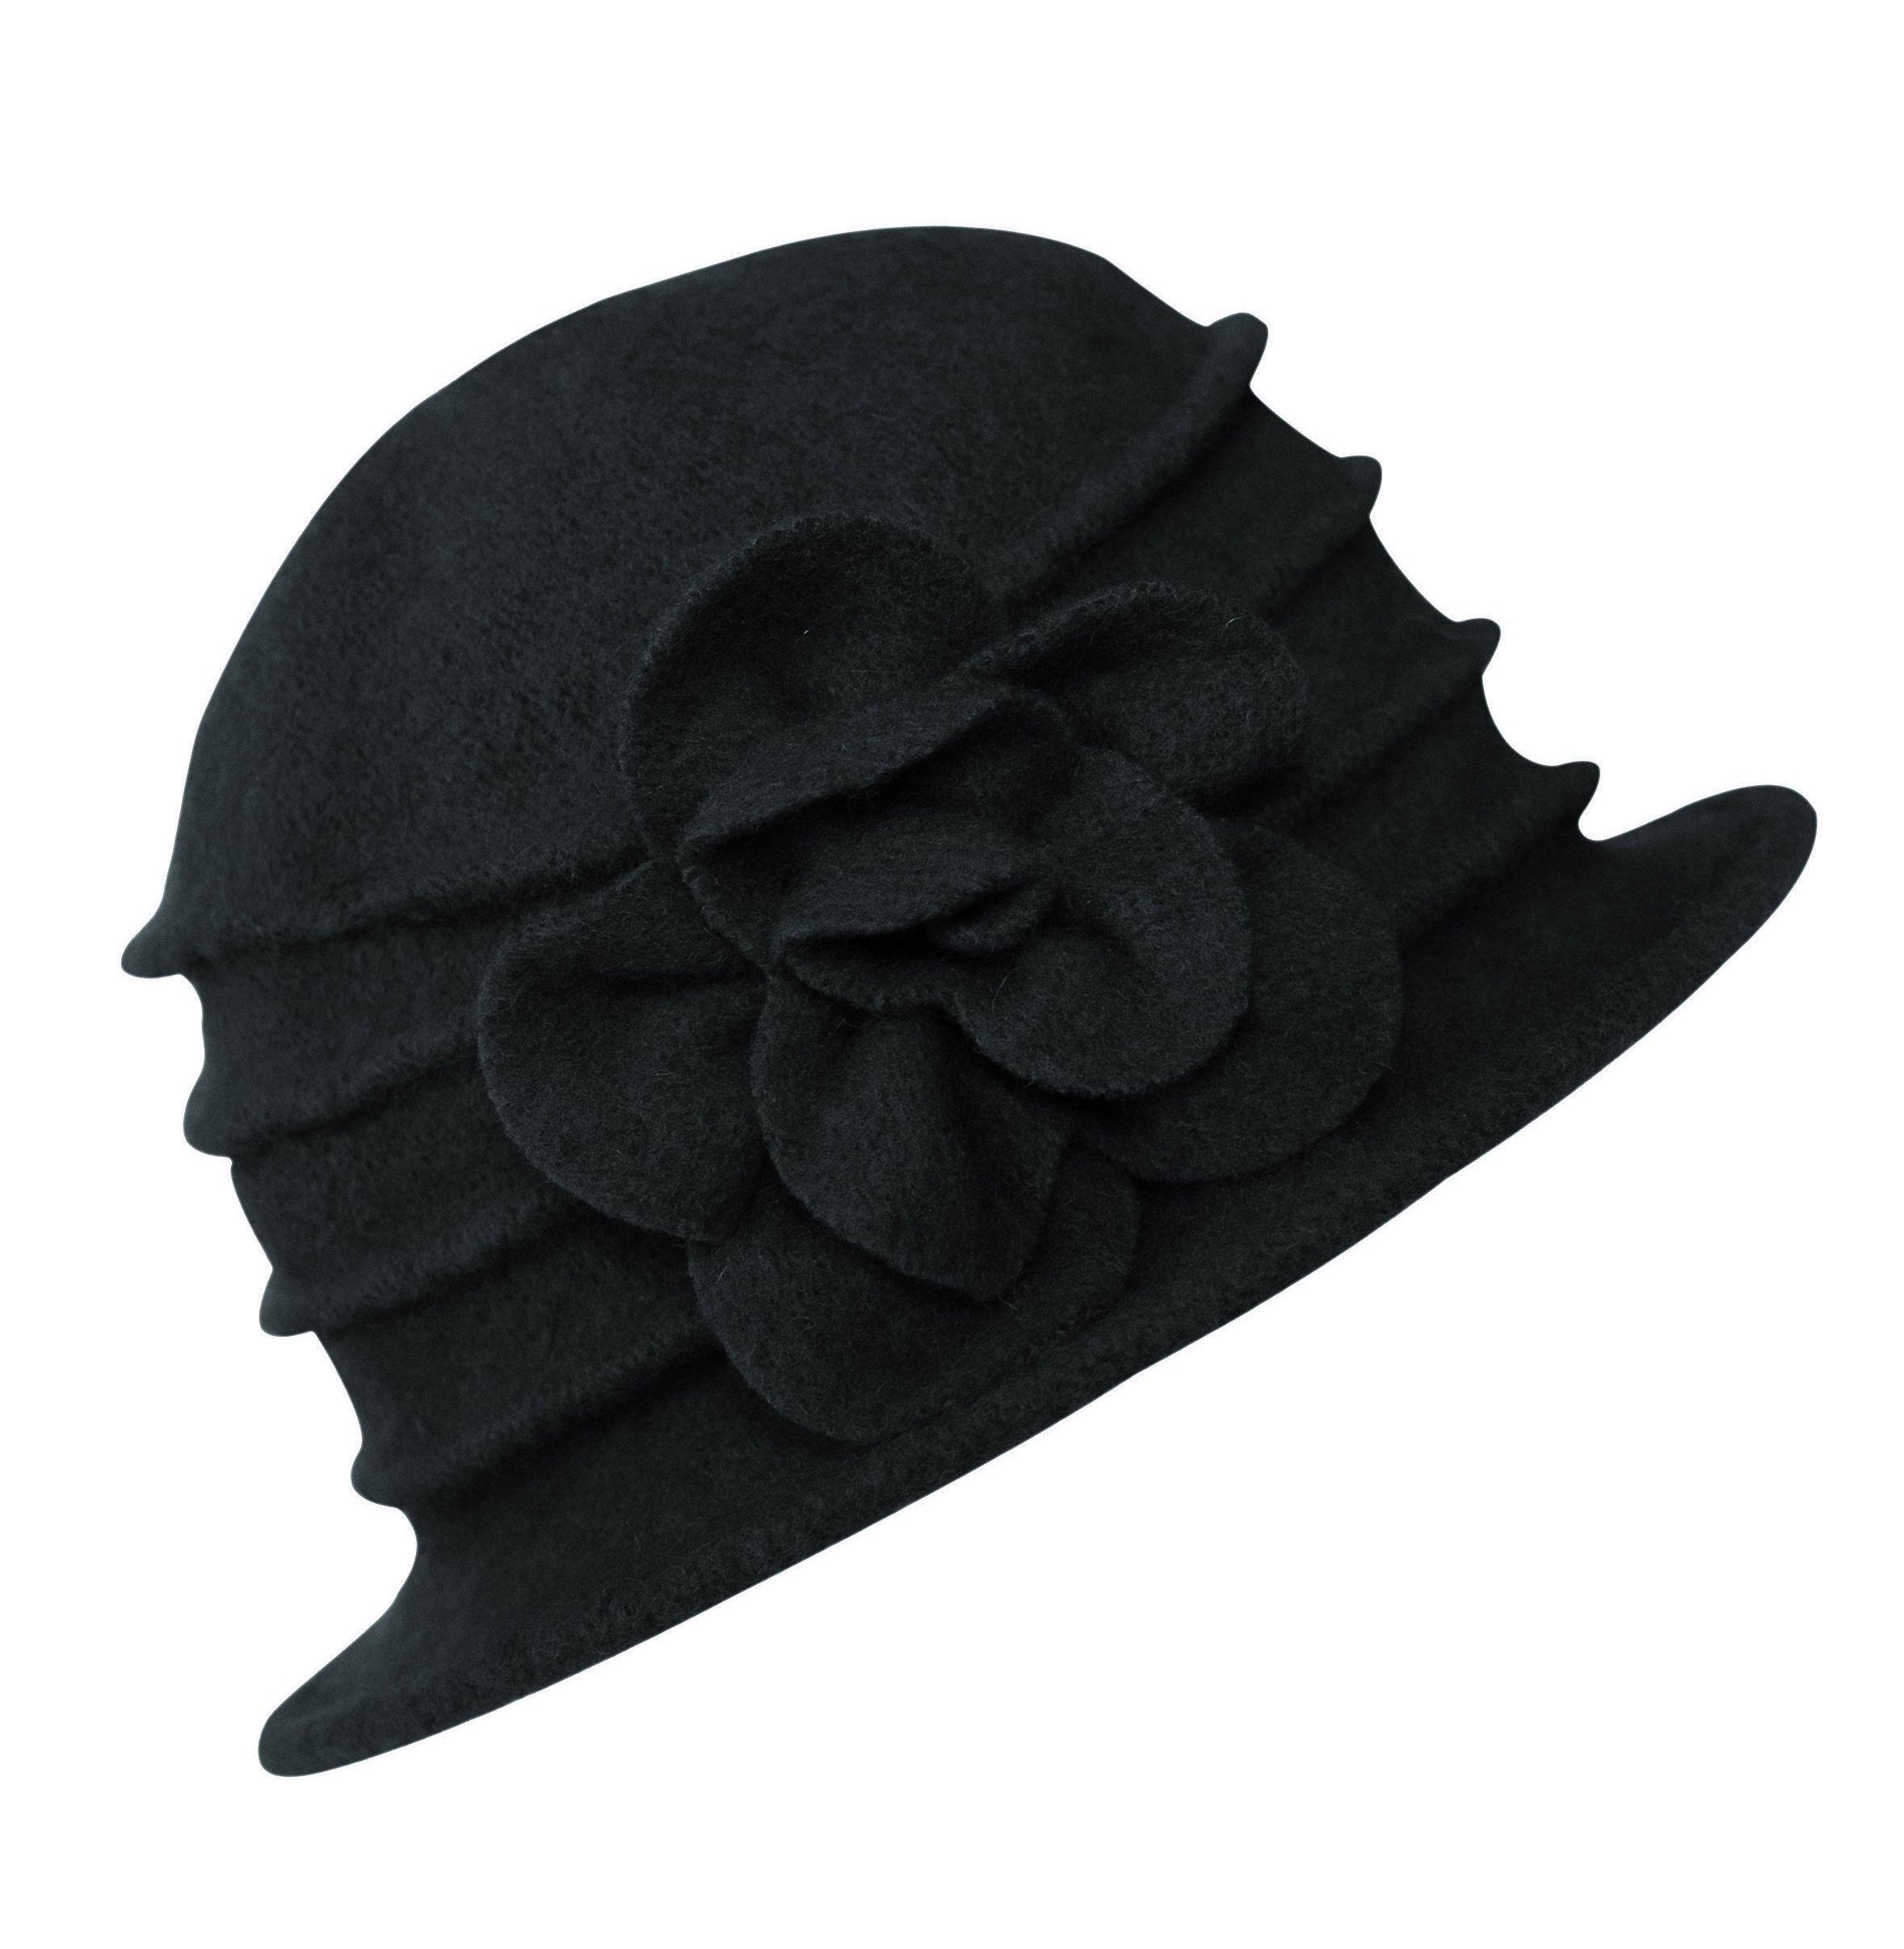 Urban CoCo Women's Floral Trimmed Wool Blend Cloche Winter Hat (Black-Model C)